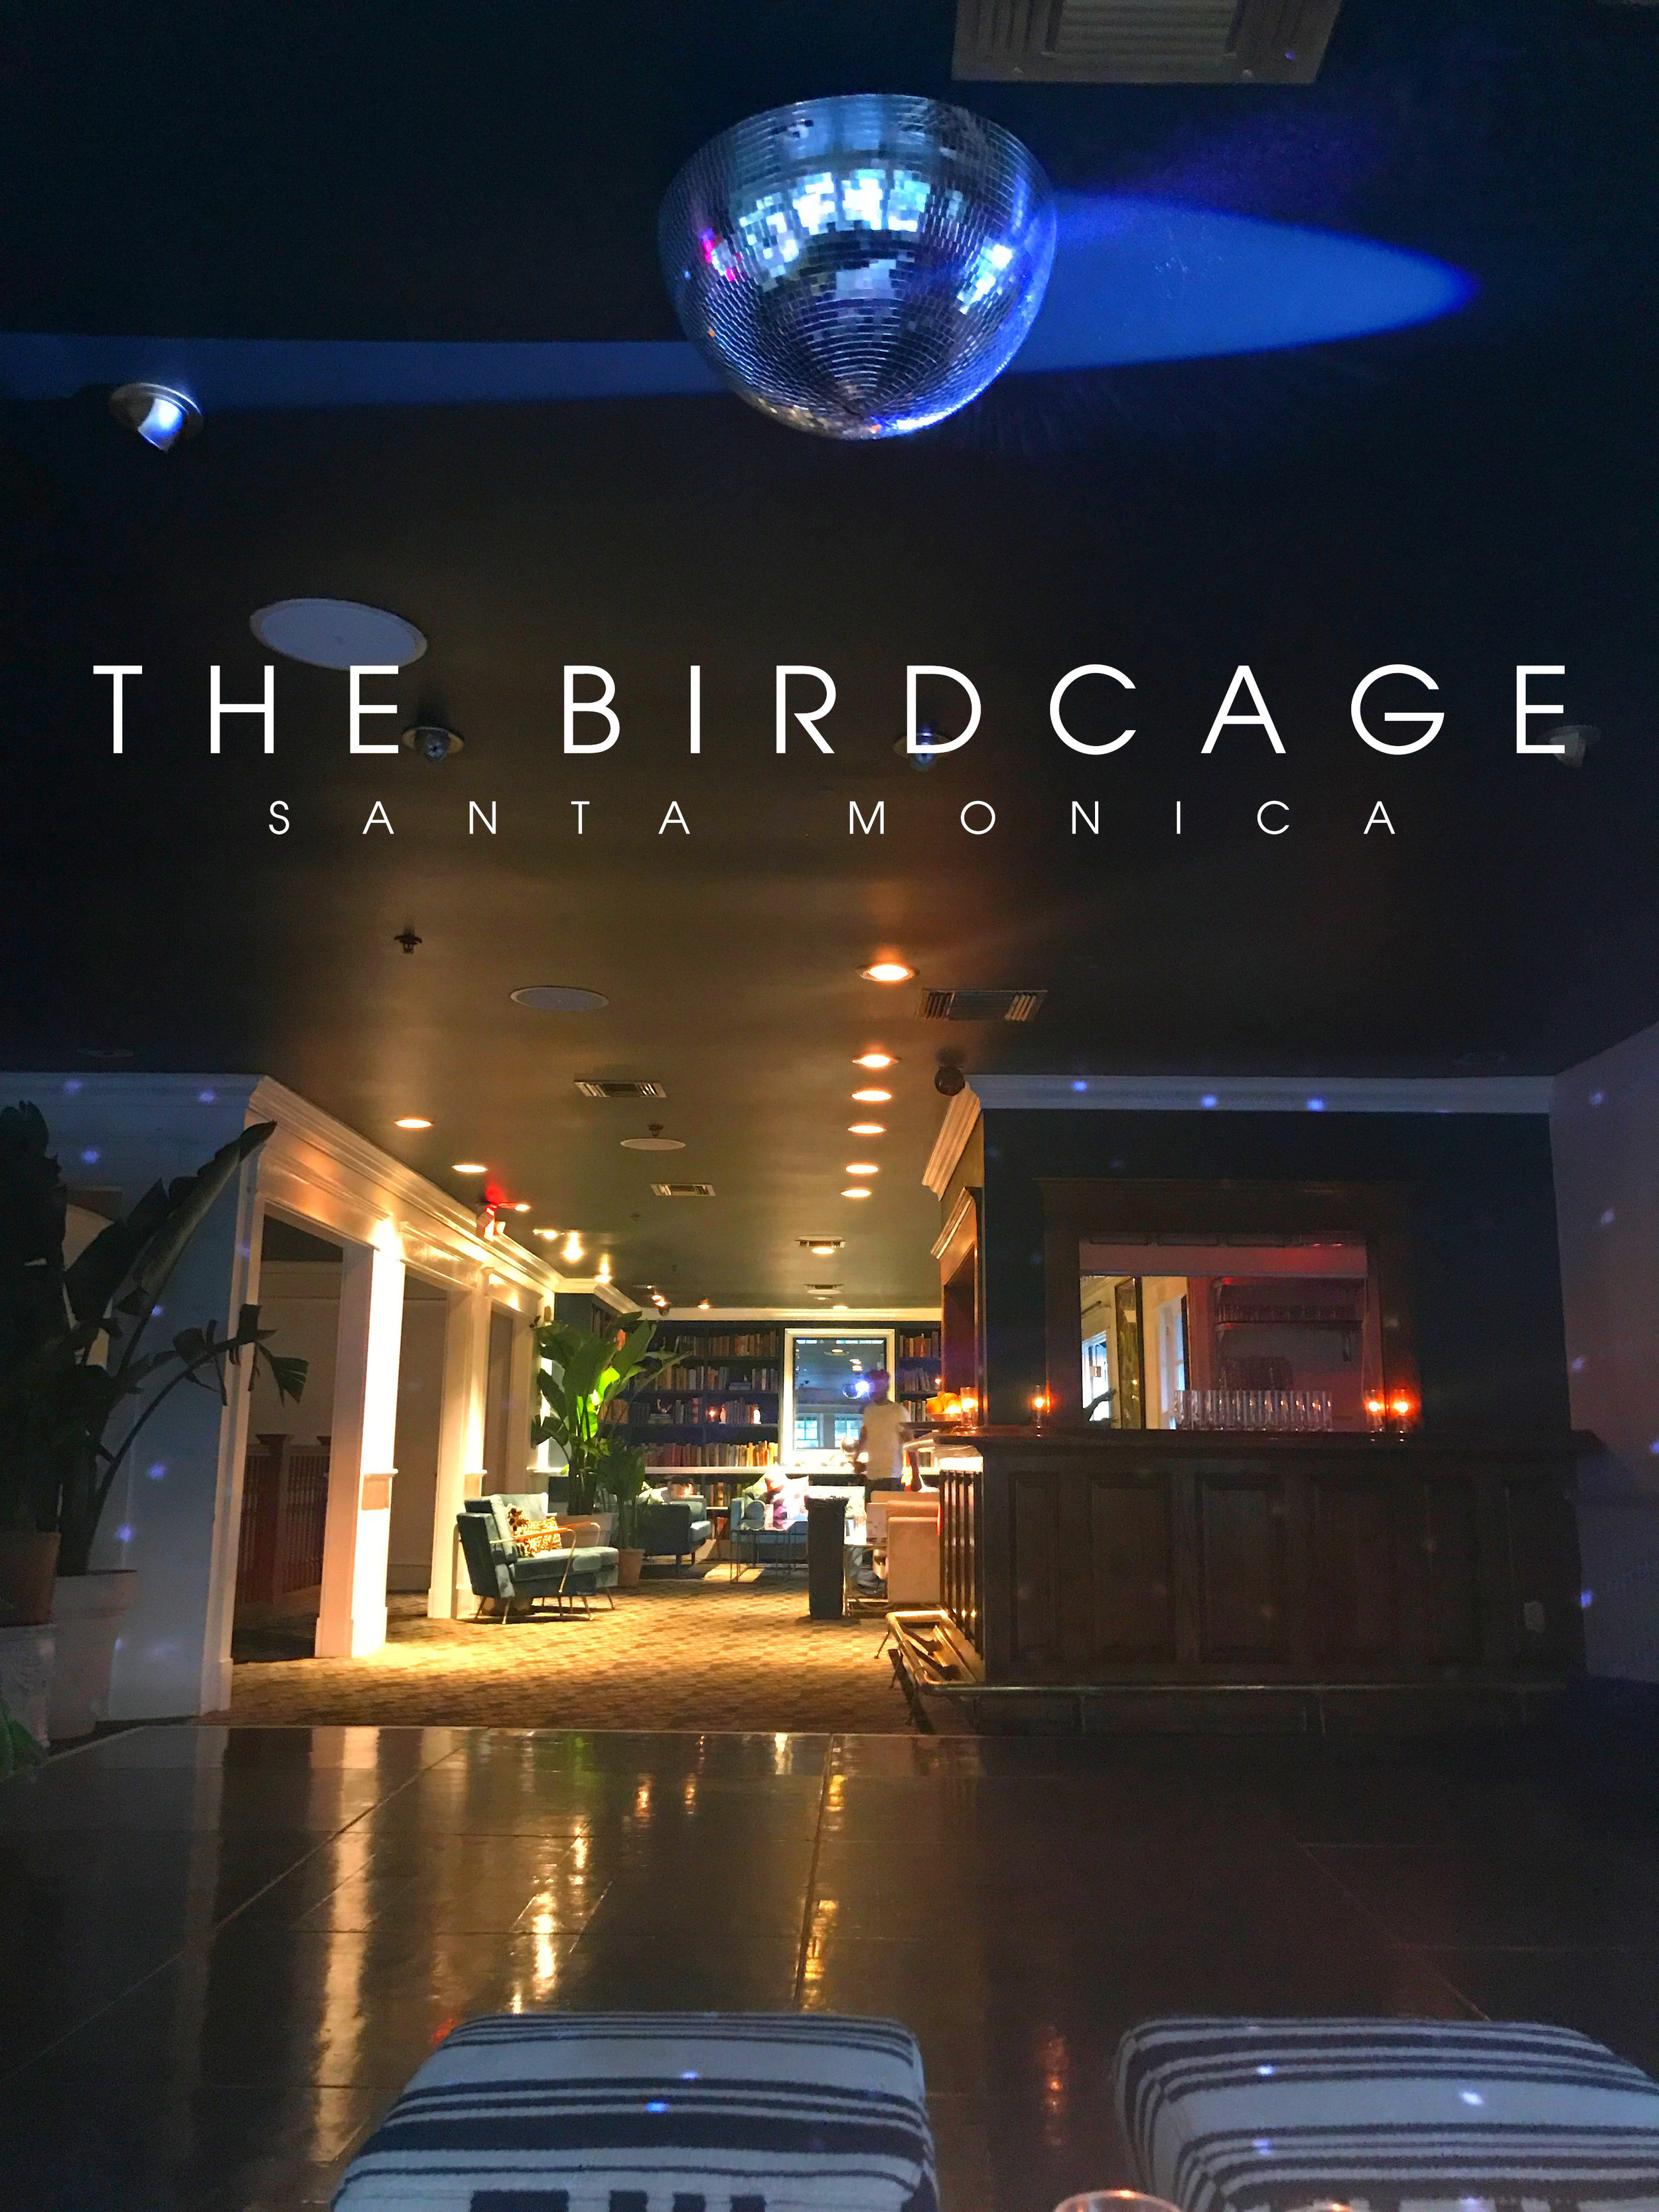 The-Birdcage-in-Santa-Monica-Cool-house-vibe-1.jpg